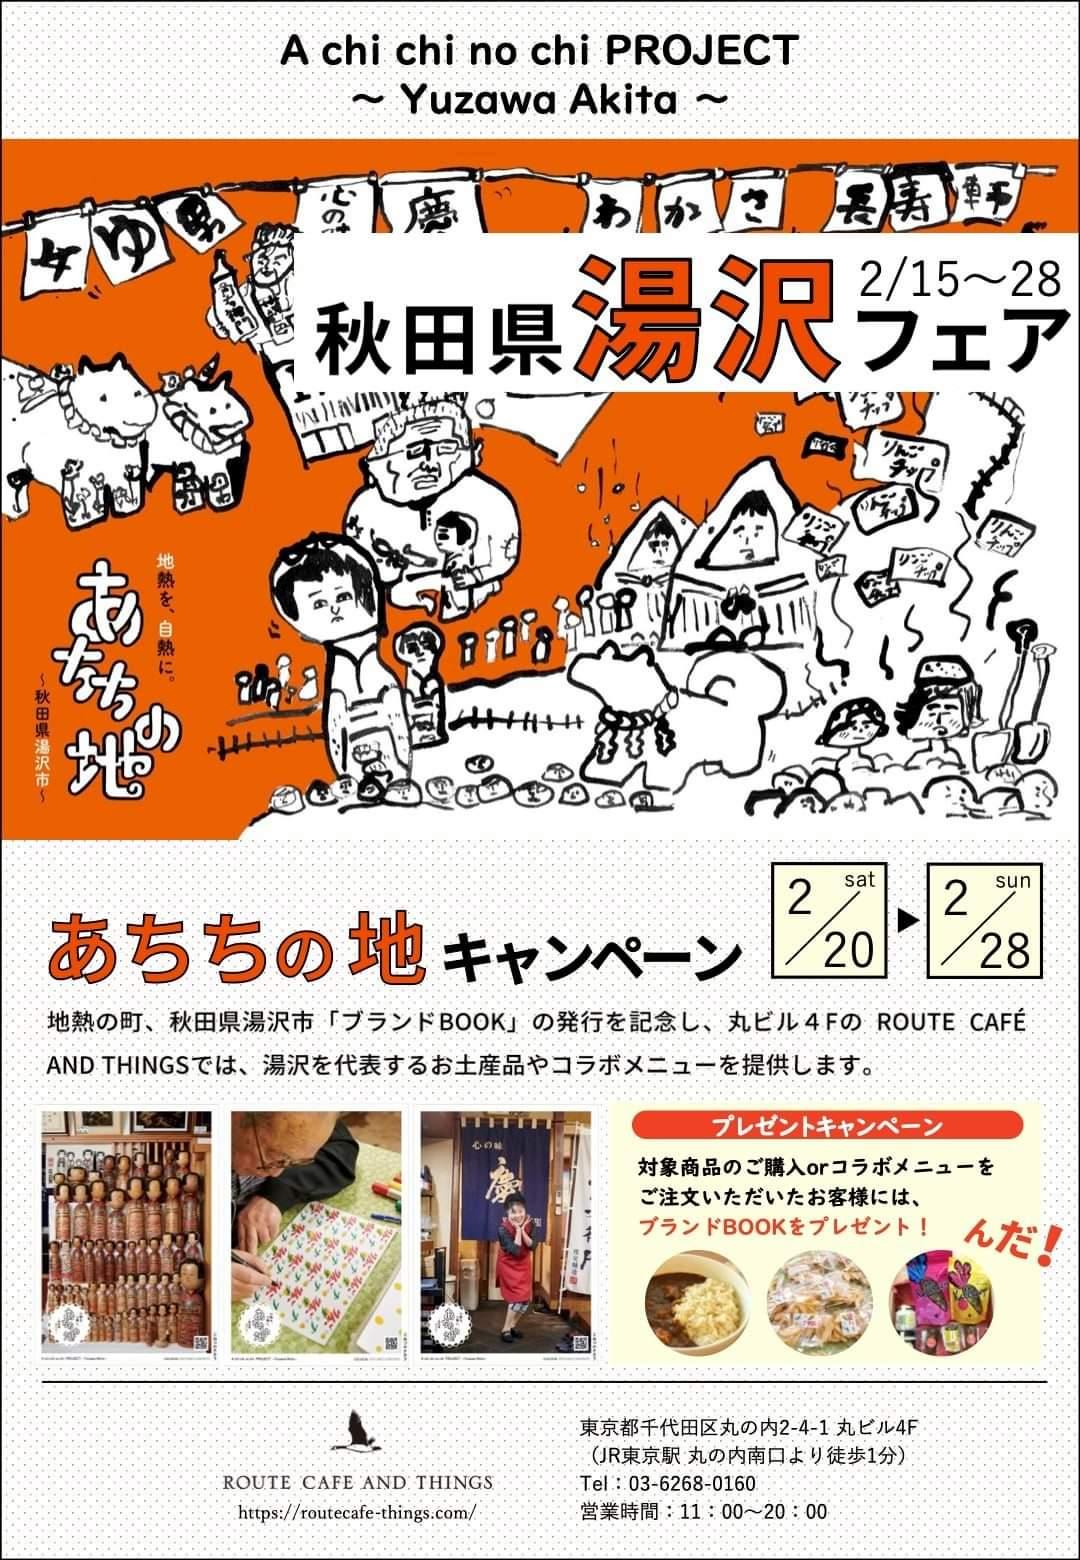 http://www.fukukomachi.com/blog/photo/FB_IMG_1613442288085.jpg